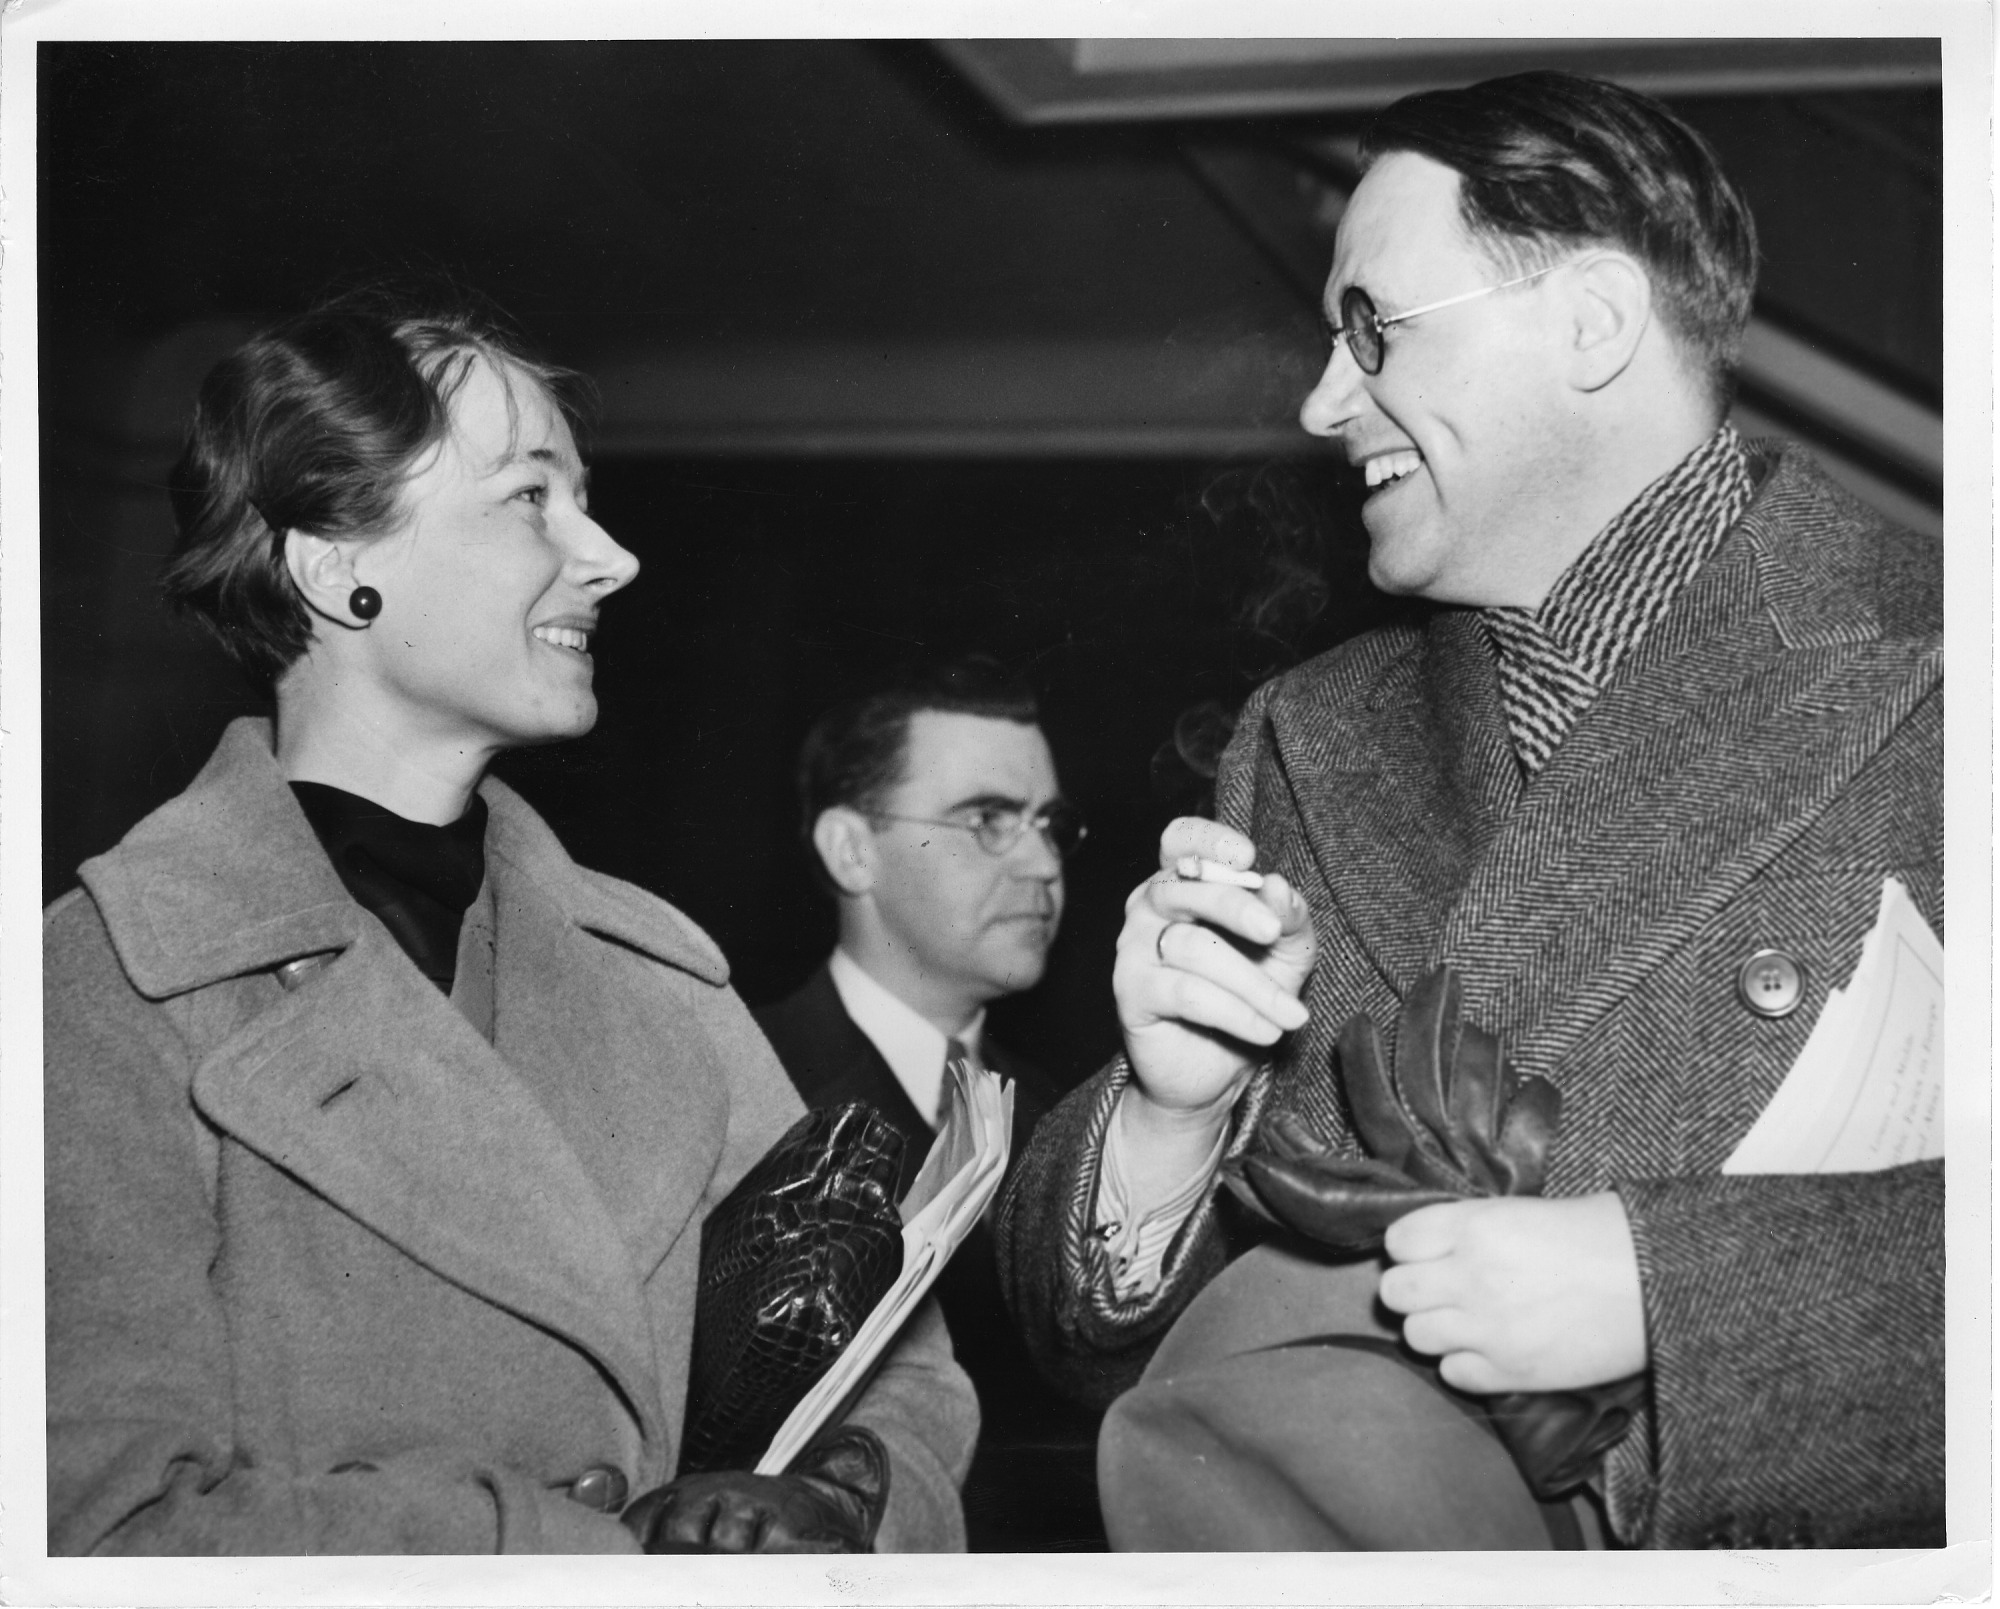 Frederica Annis Lopez de Leo de Laguna (1906-2004), standing and talking at meeting with Kaj Birket-Smith (1893-1977)